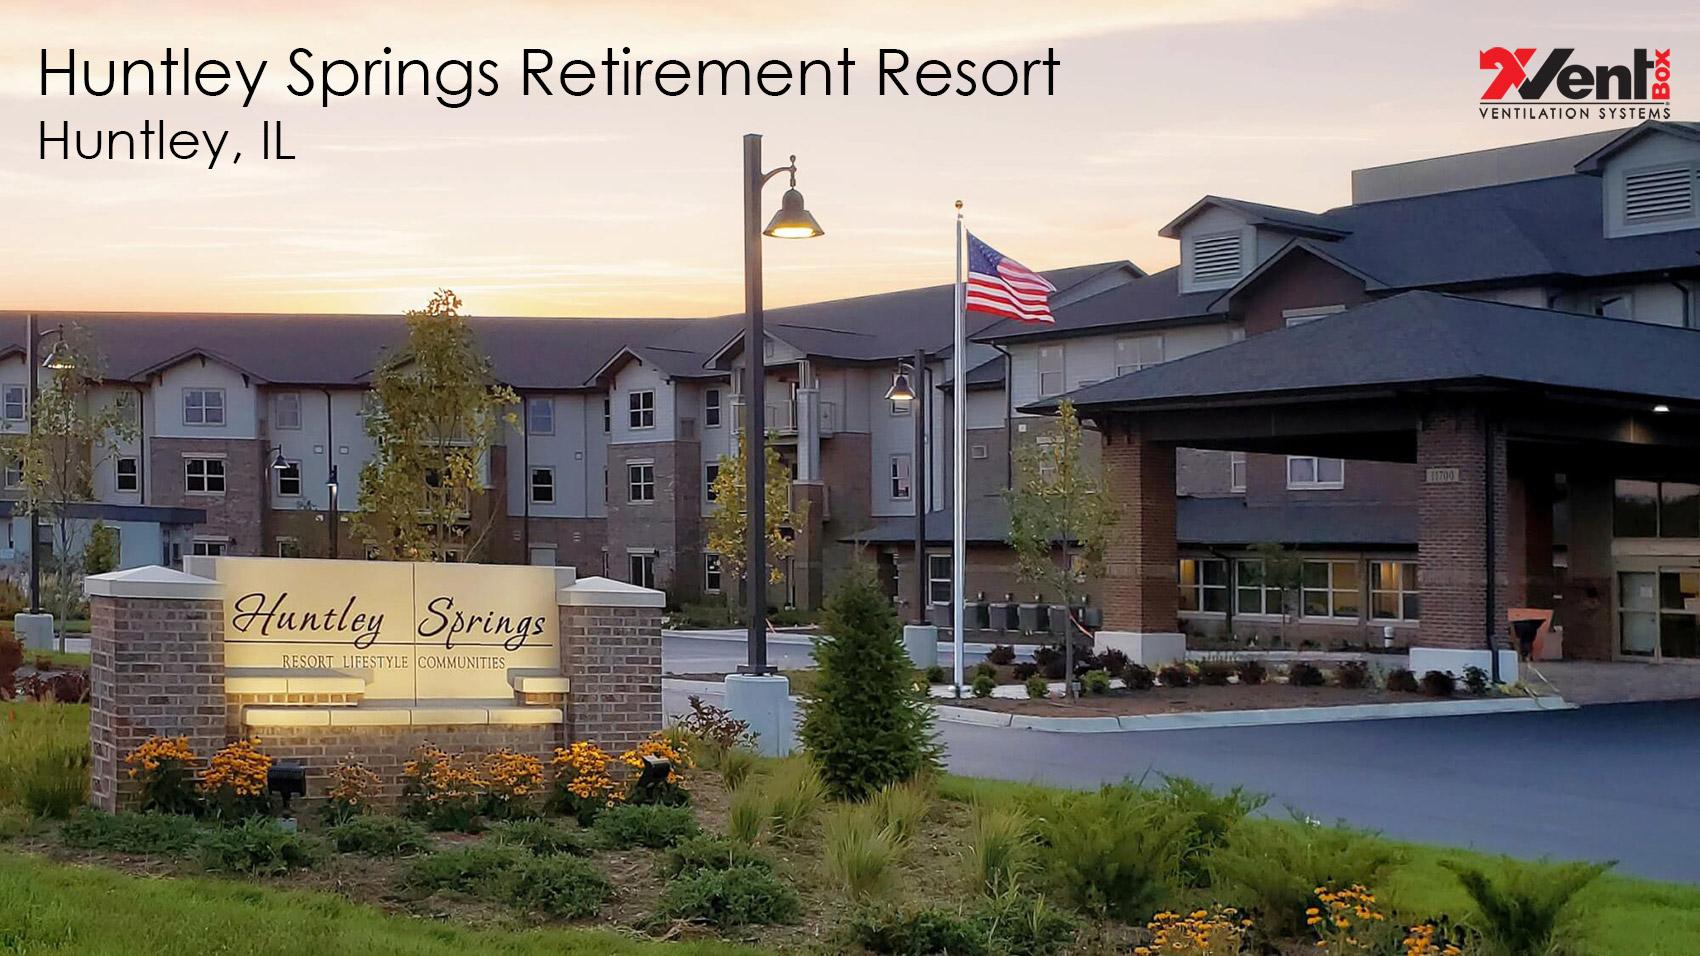 Huntley Springs Retirement Resort